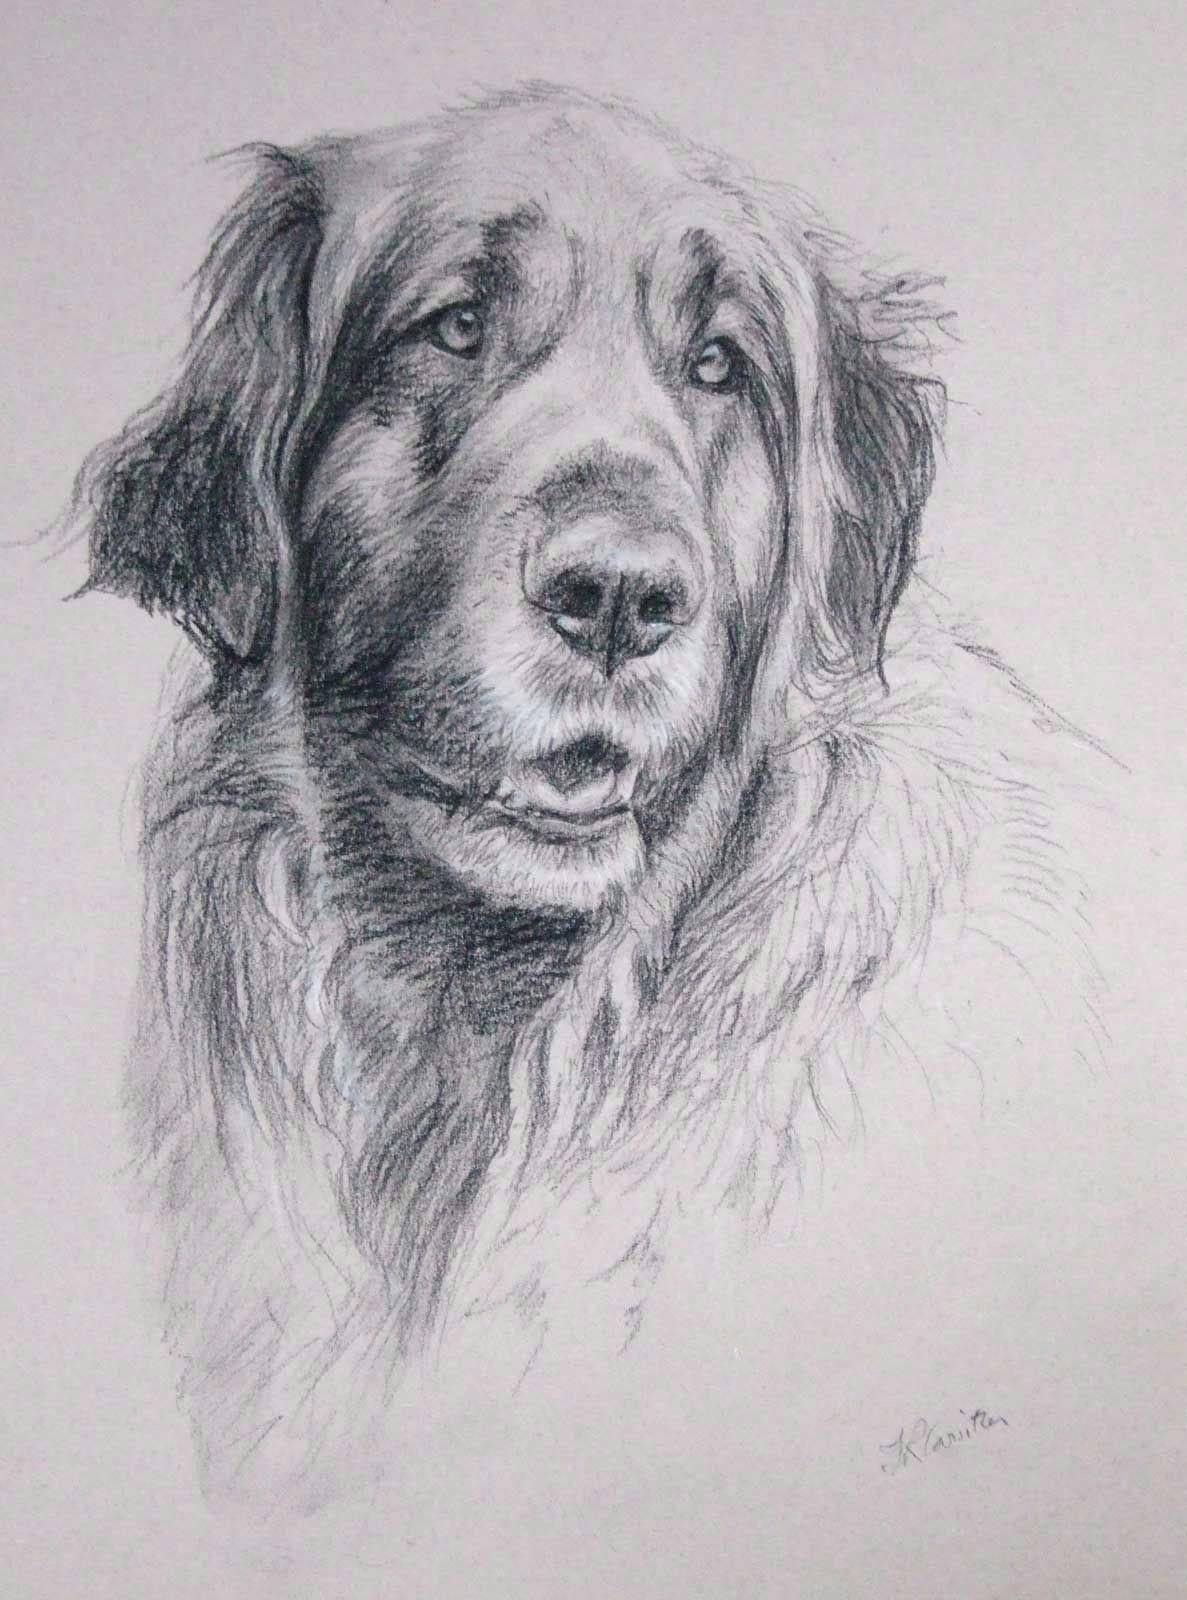 leonberger dog 2 carbon pencil on paper petportraits petportrait dog leonberger dogportrait petart petpainting dogart dogpainting johncarwithen